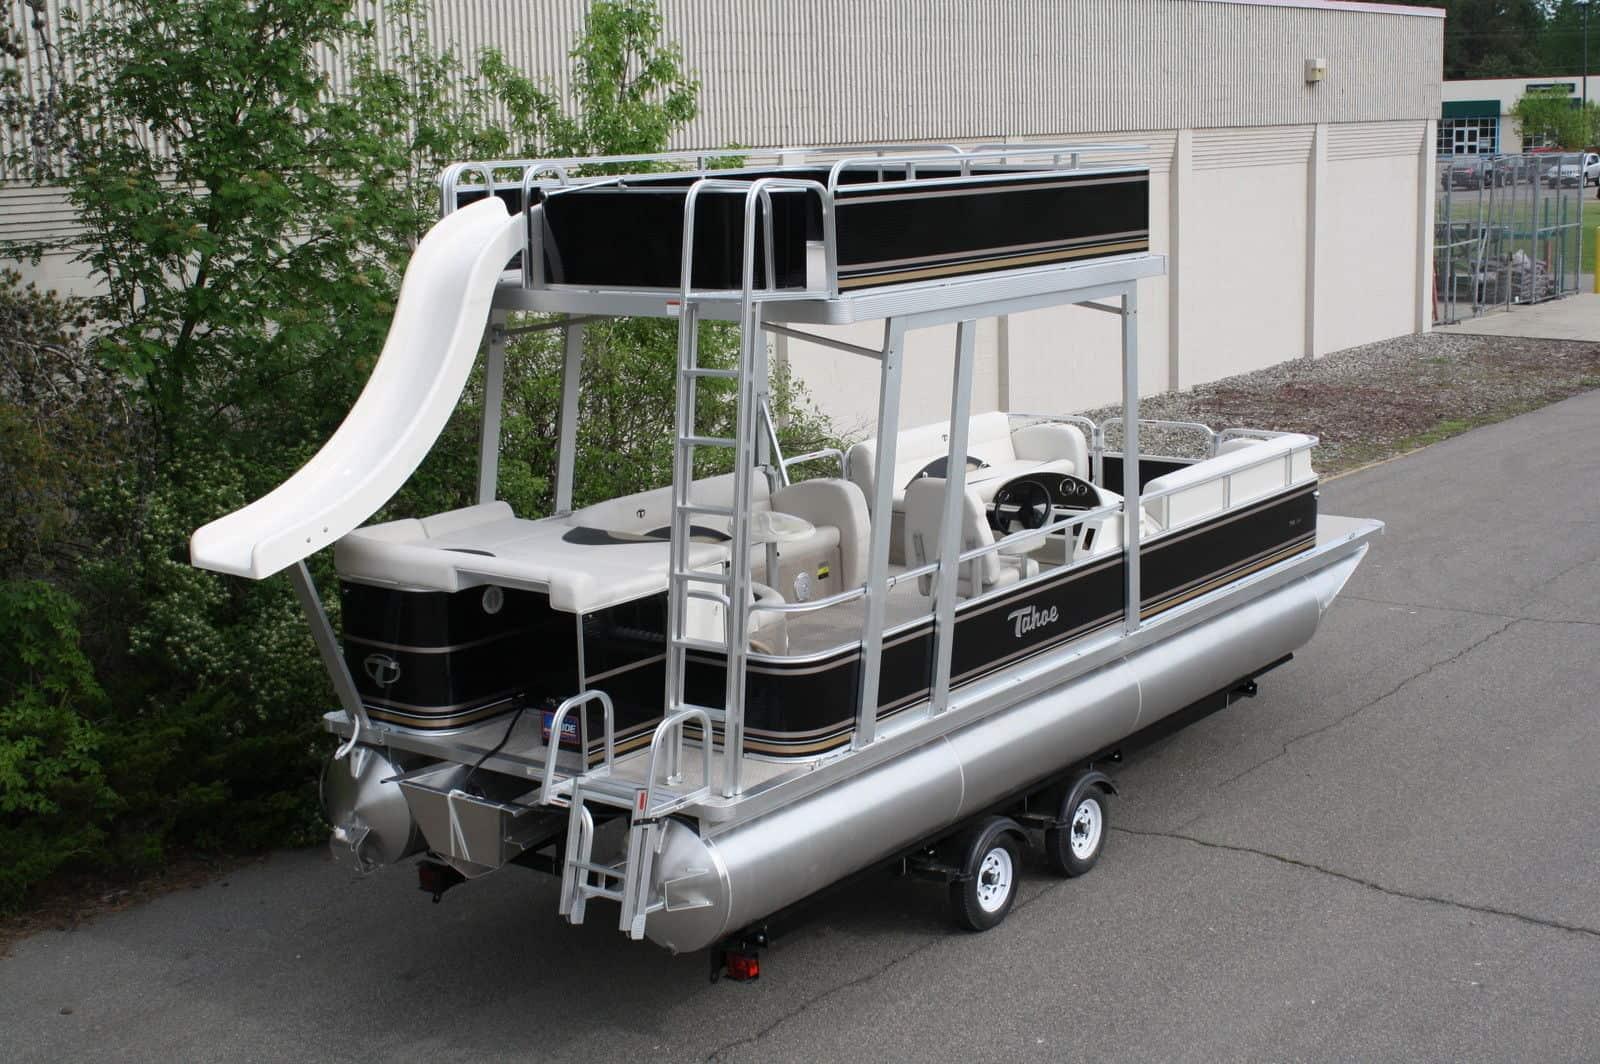 Tahoe Vista Funship – pontoon boat